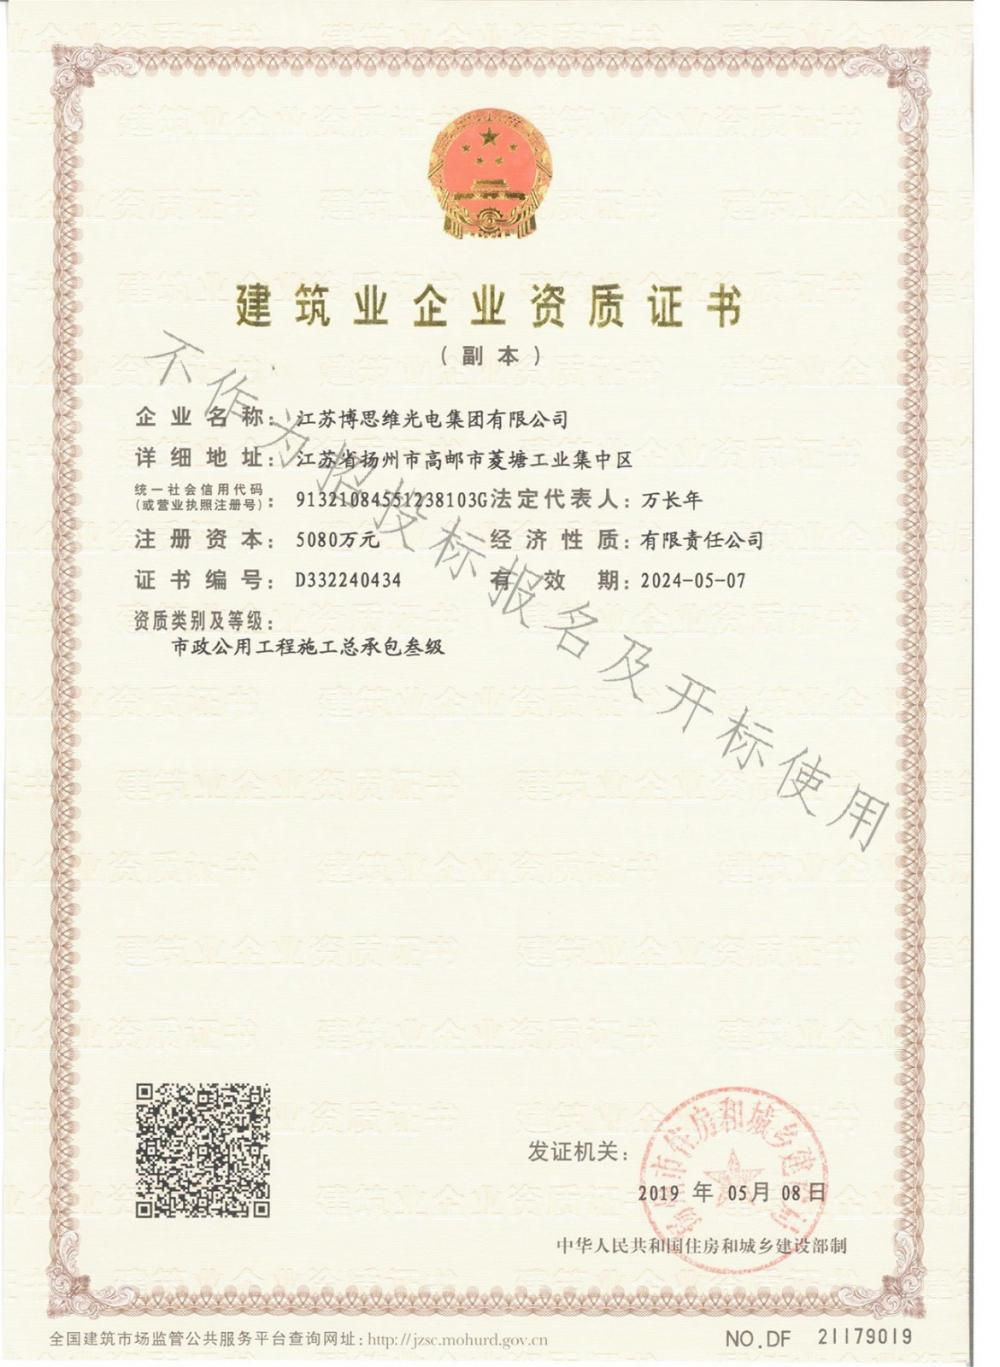 Installation qualification